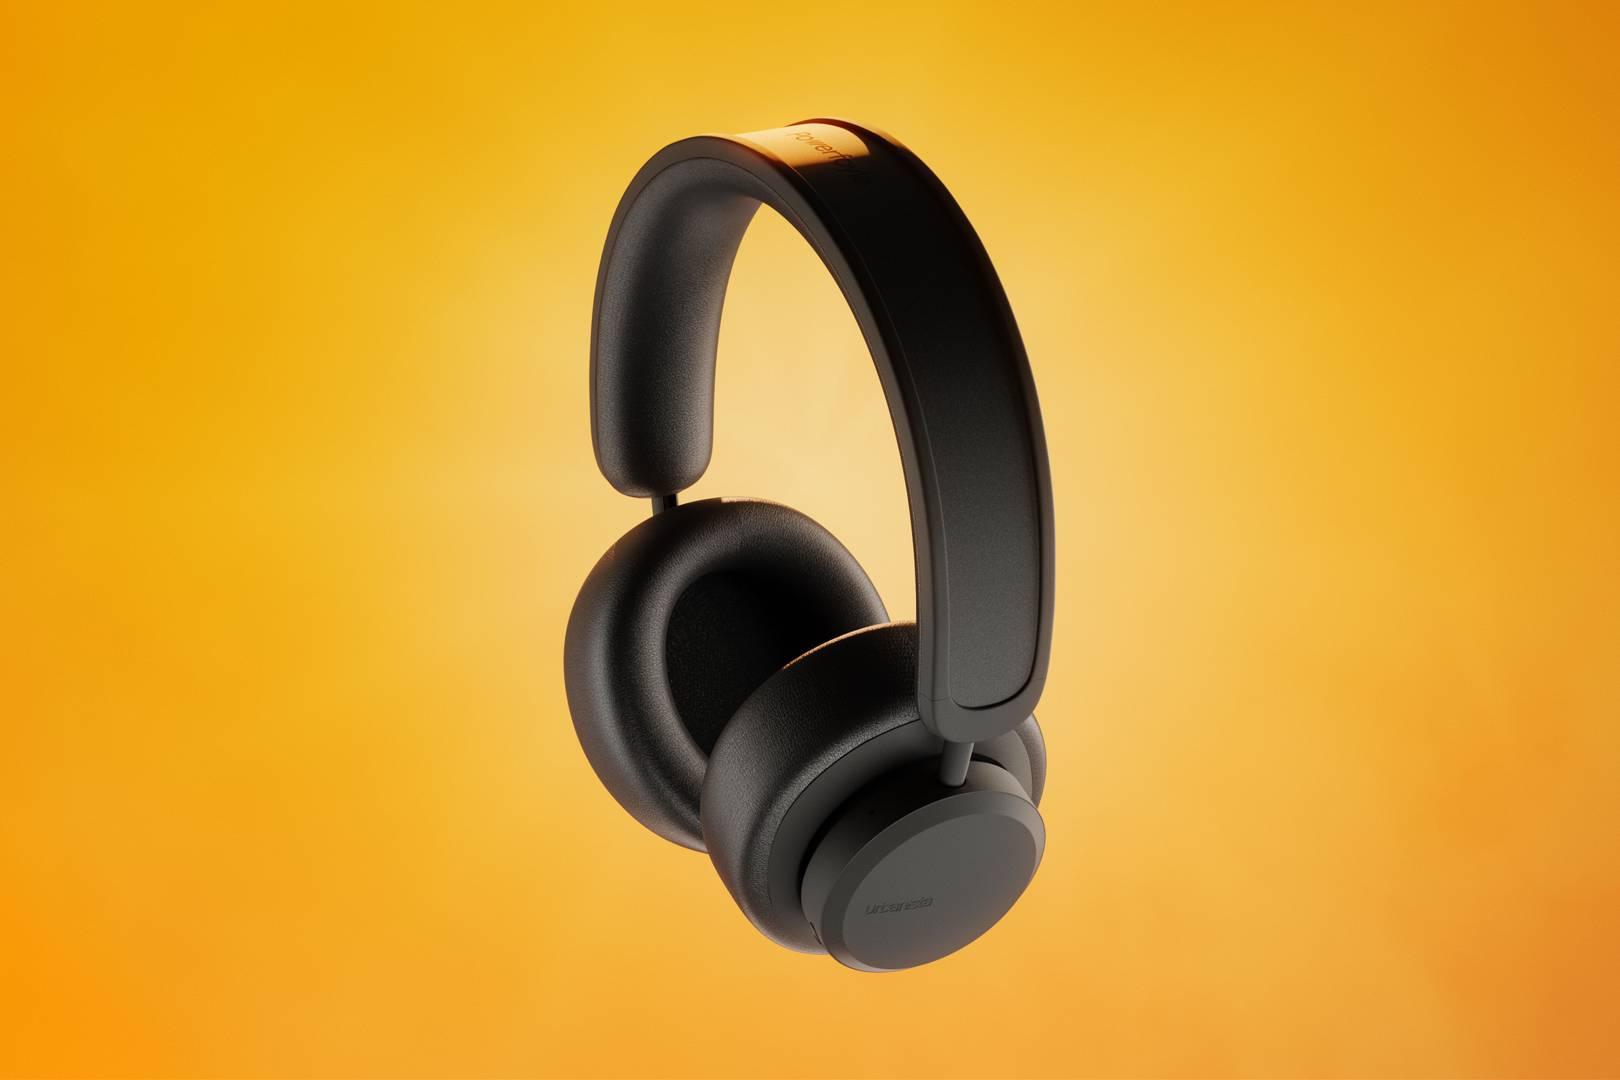 Urbanista has made the world's first solar-powered headphones